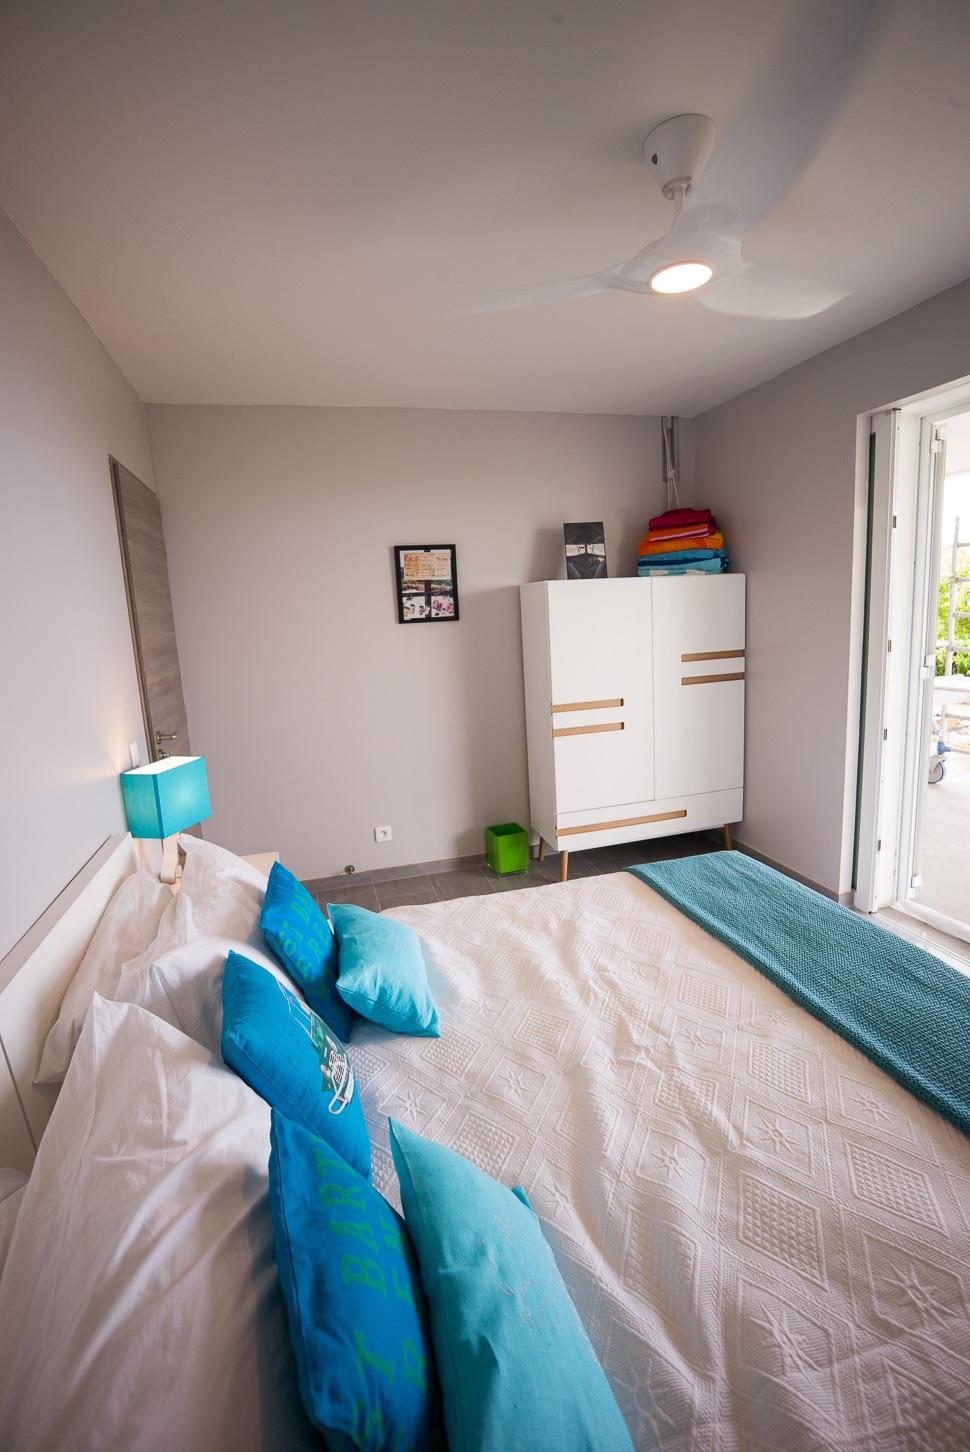 Second Bedroom, Side View / Chambre 2, Vue Latérale